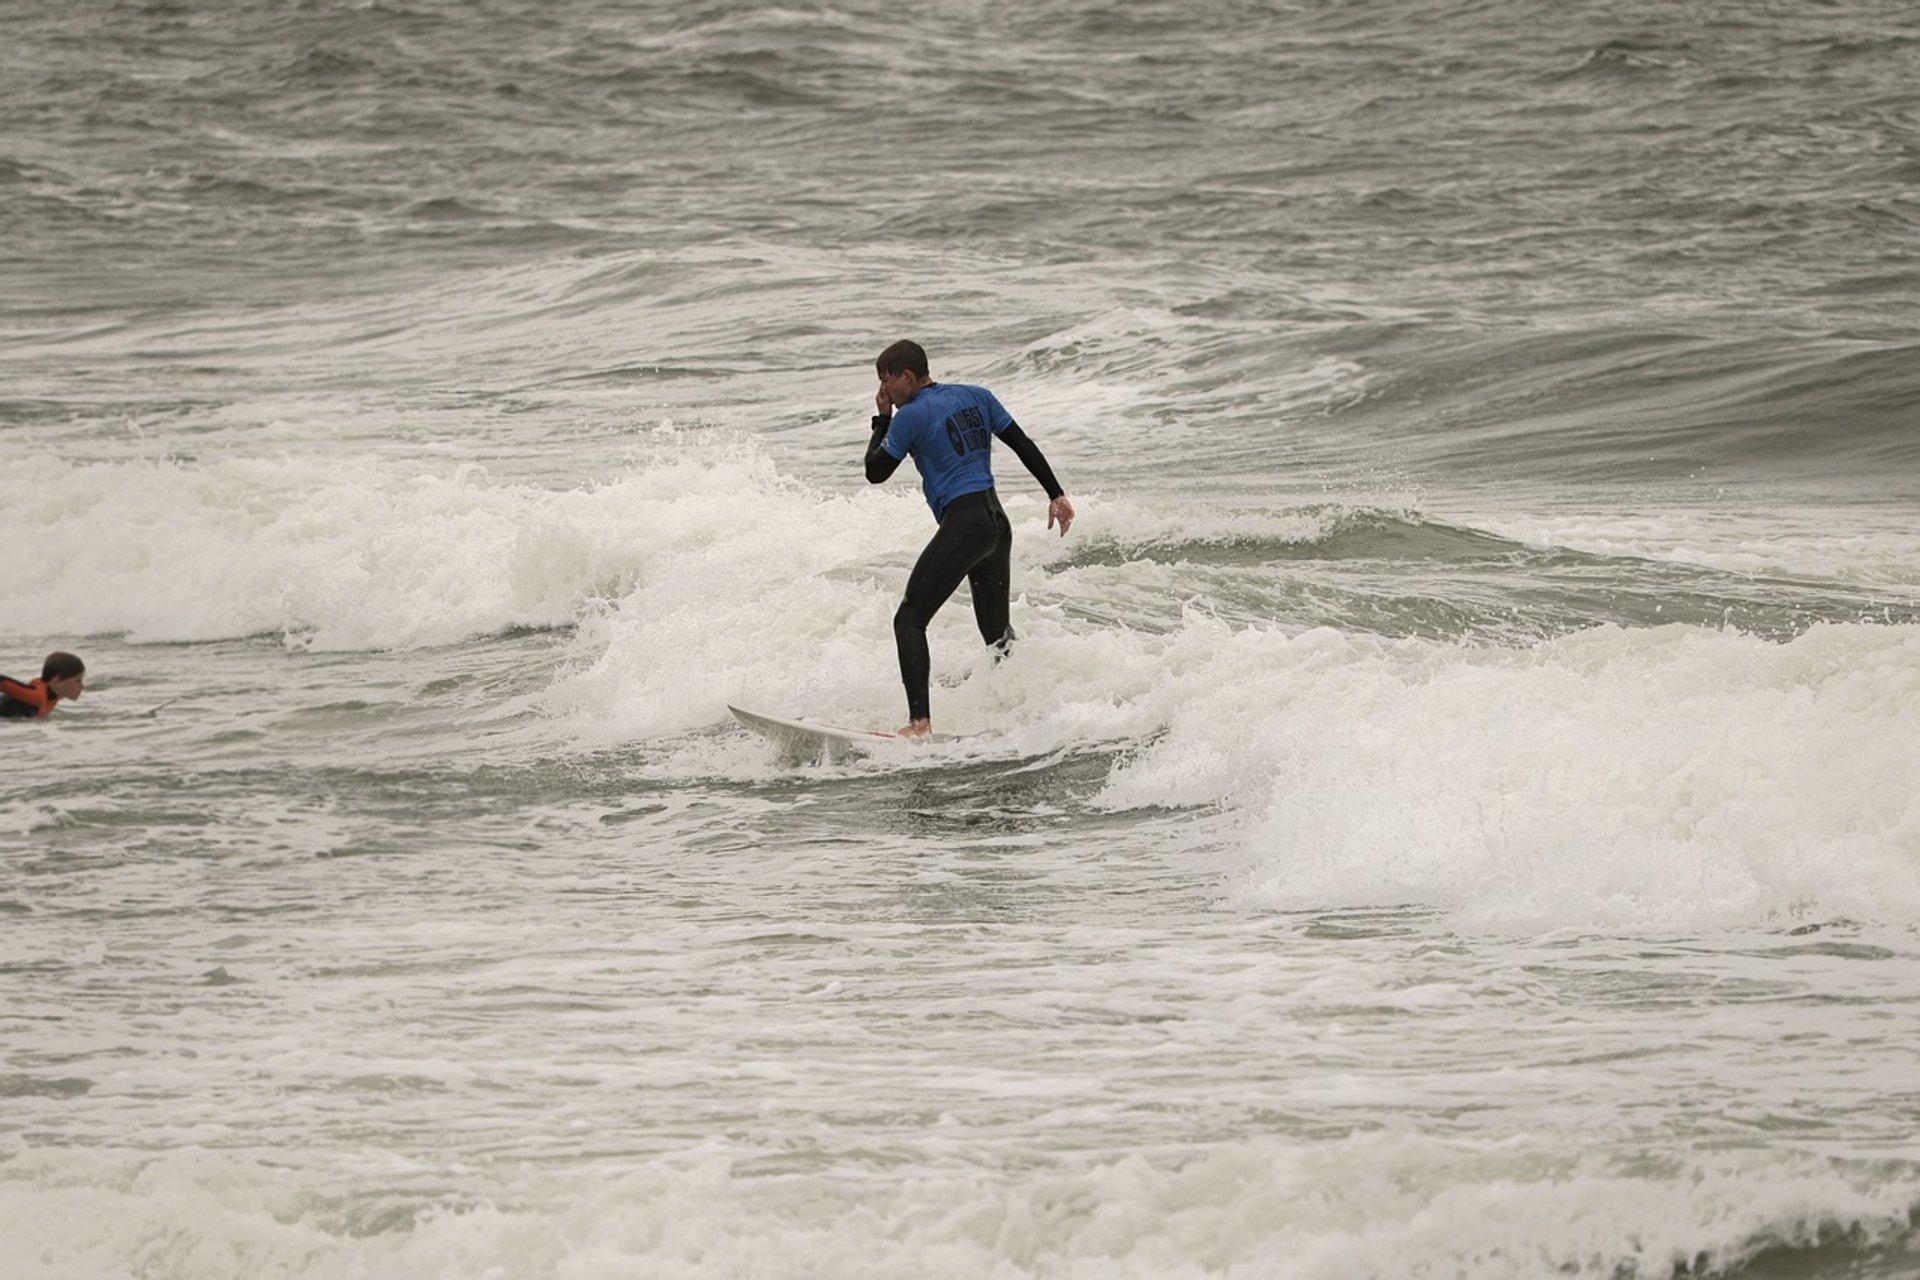 Surfing Experience in Vietnam 2020 - Best Time